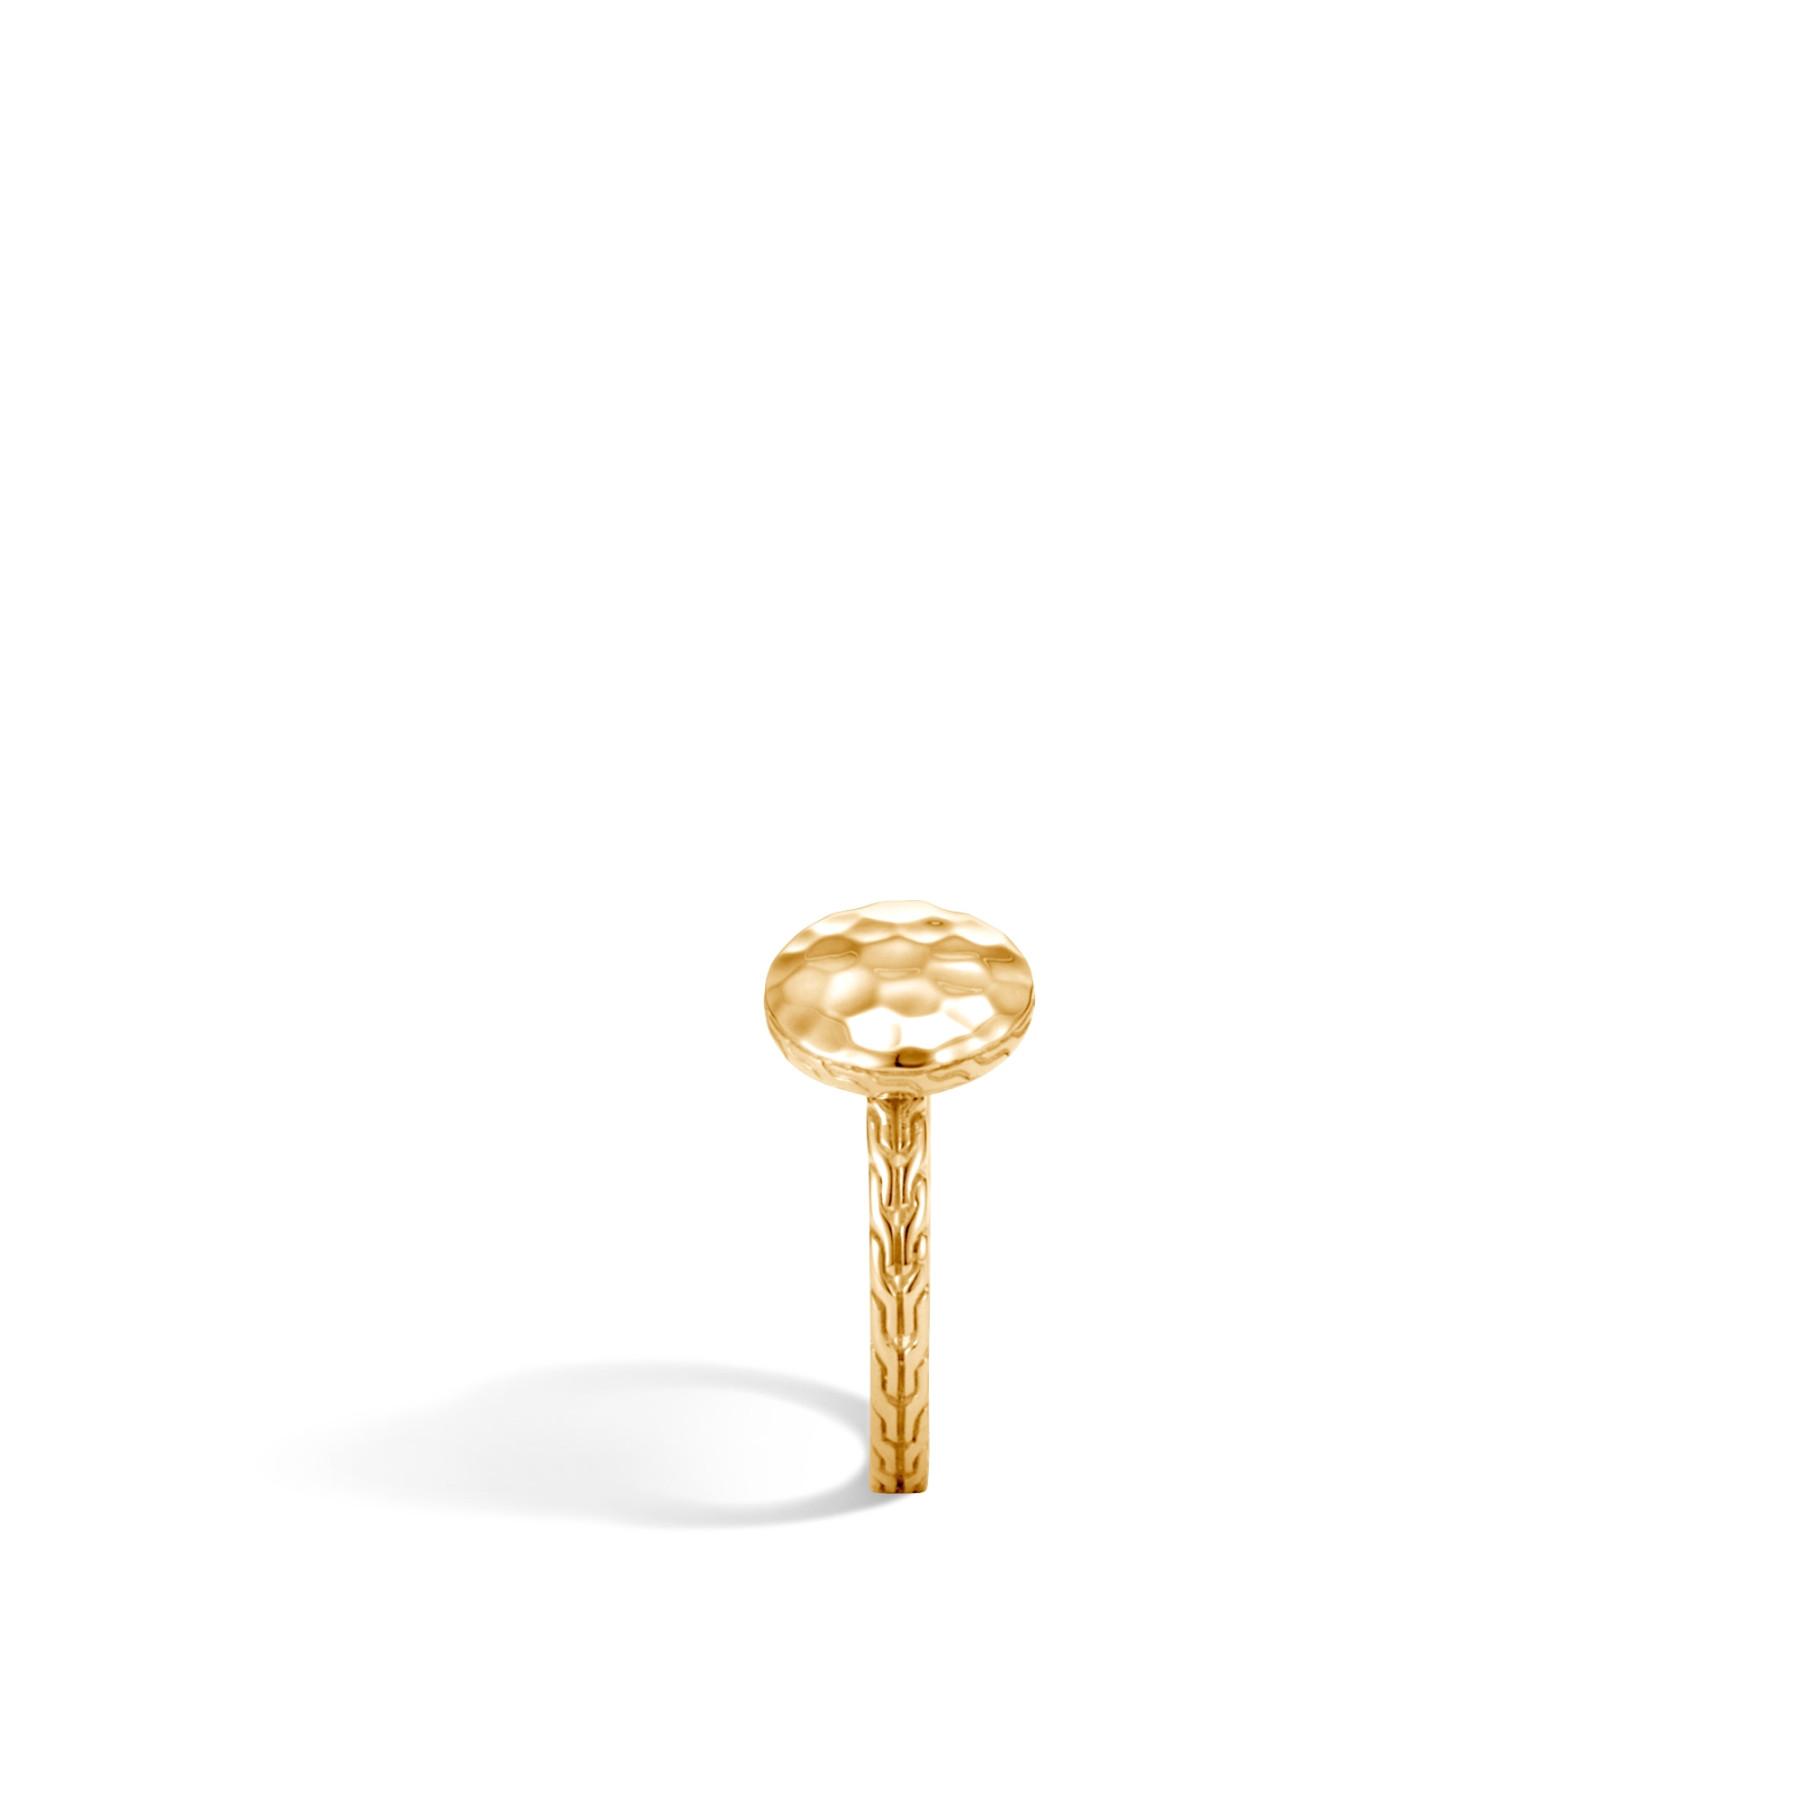 John Hardy Dot Gold Ring alt image